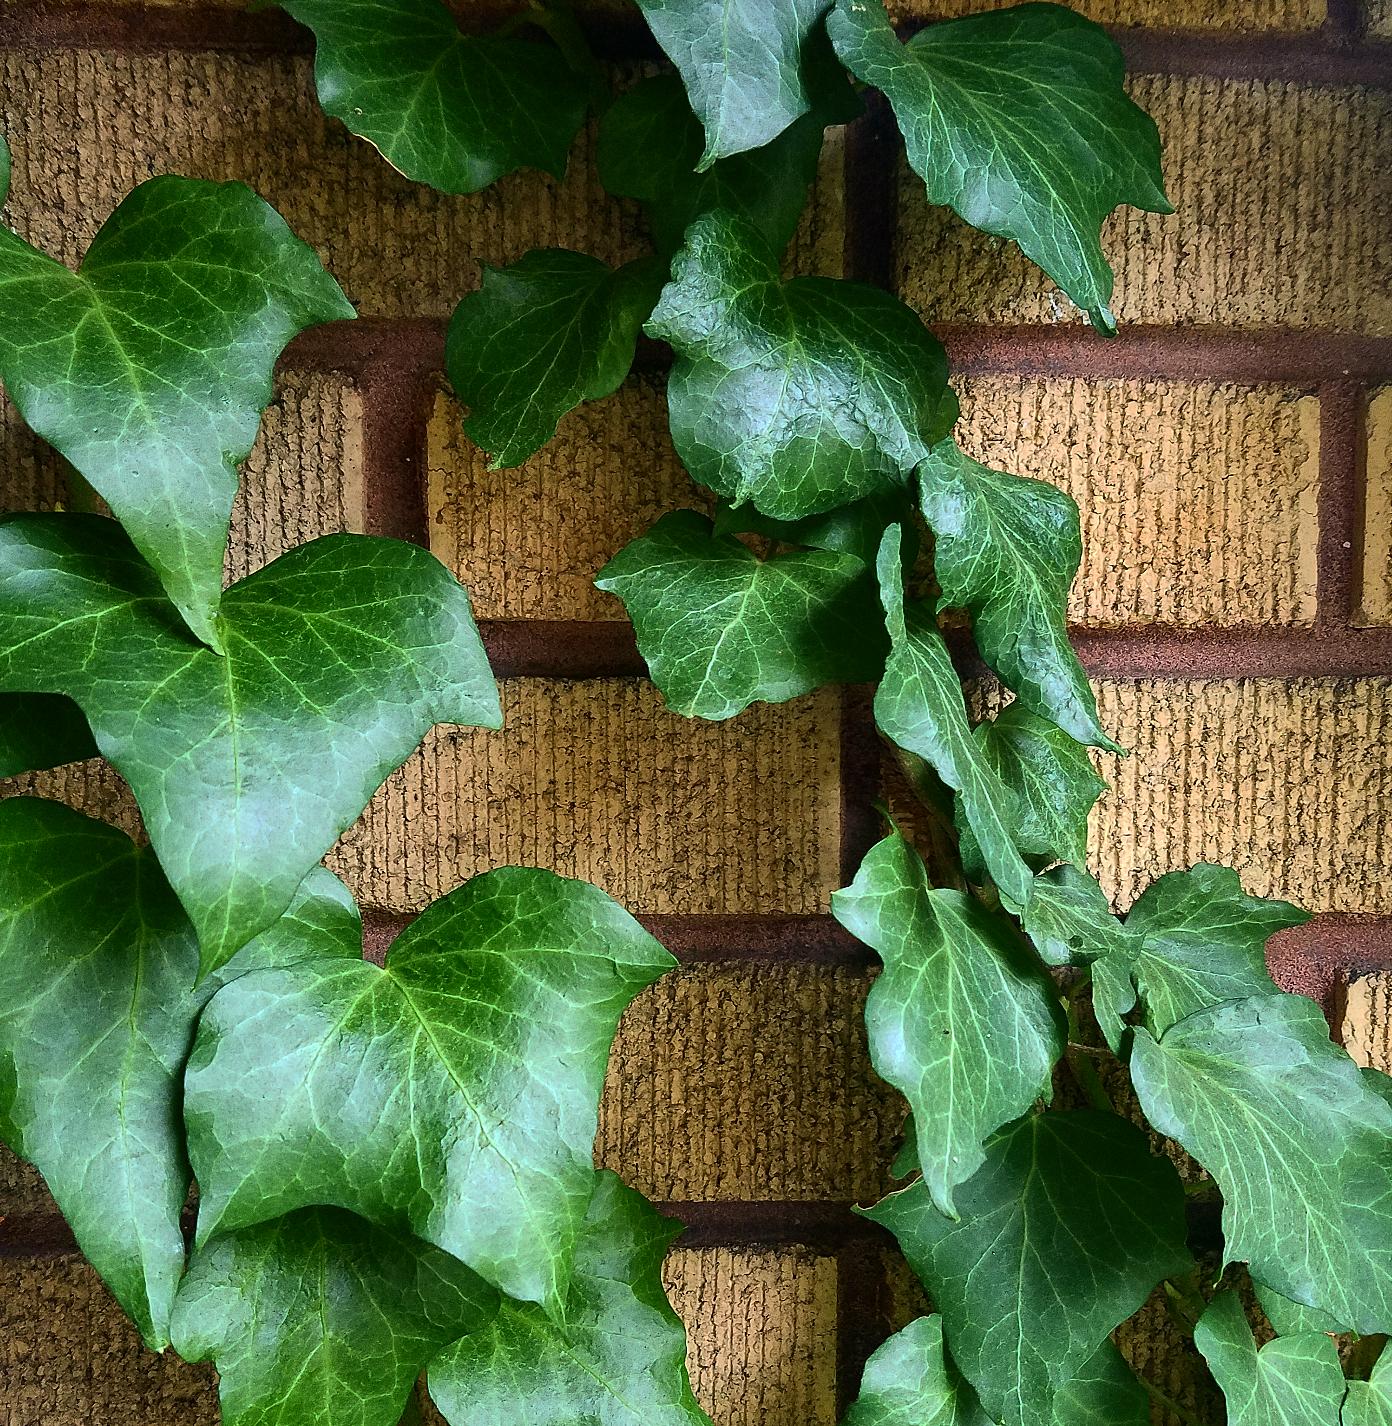 yellow bricks yellow brick home English Ivy Ivy growing on bricks